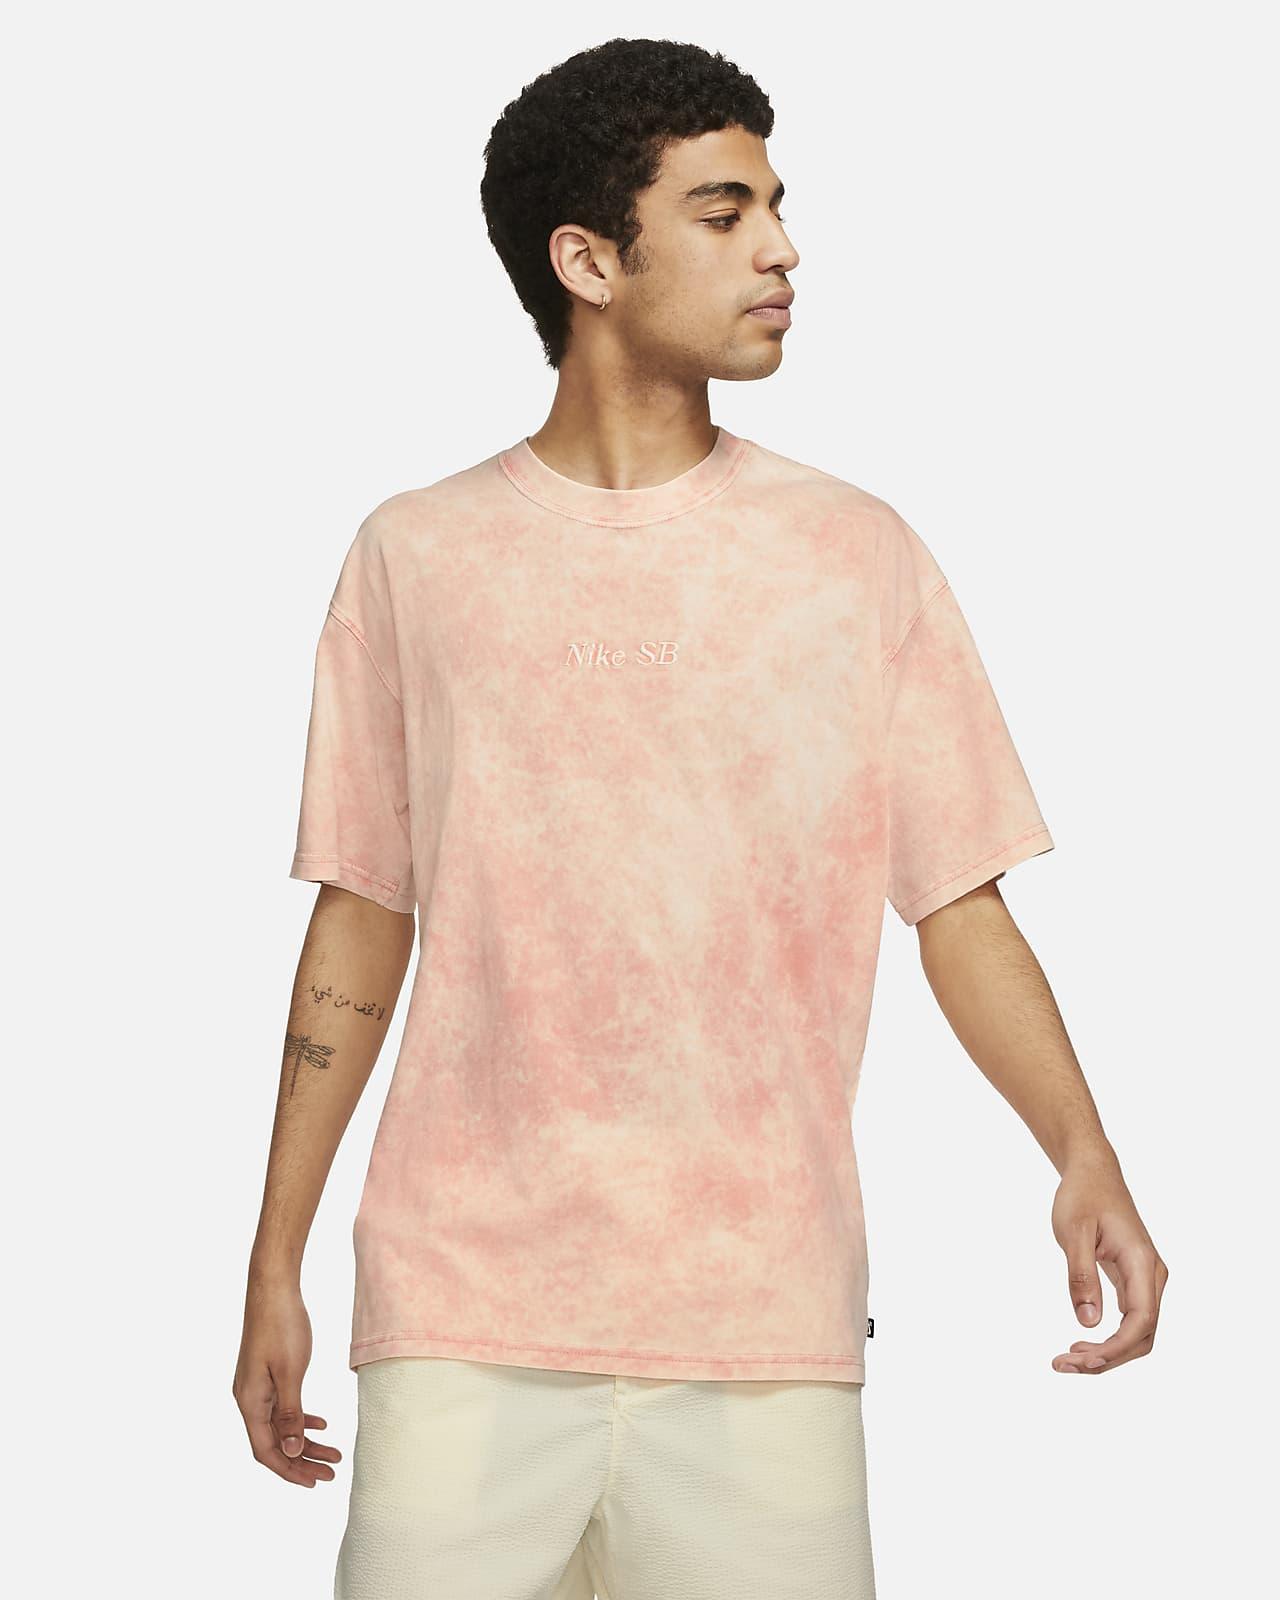 Nike SB-forvasket skater-T-shirt